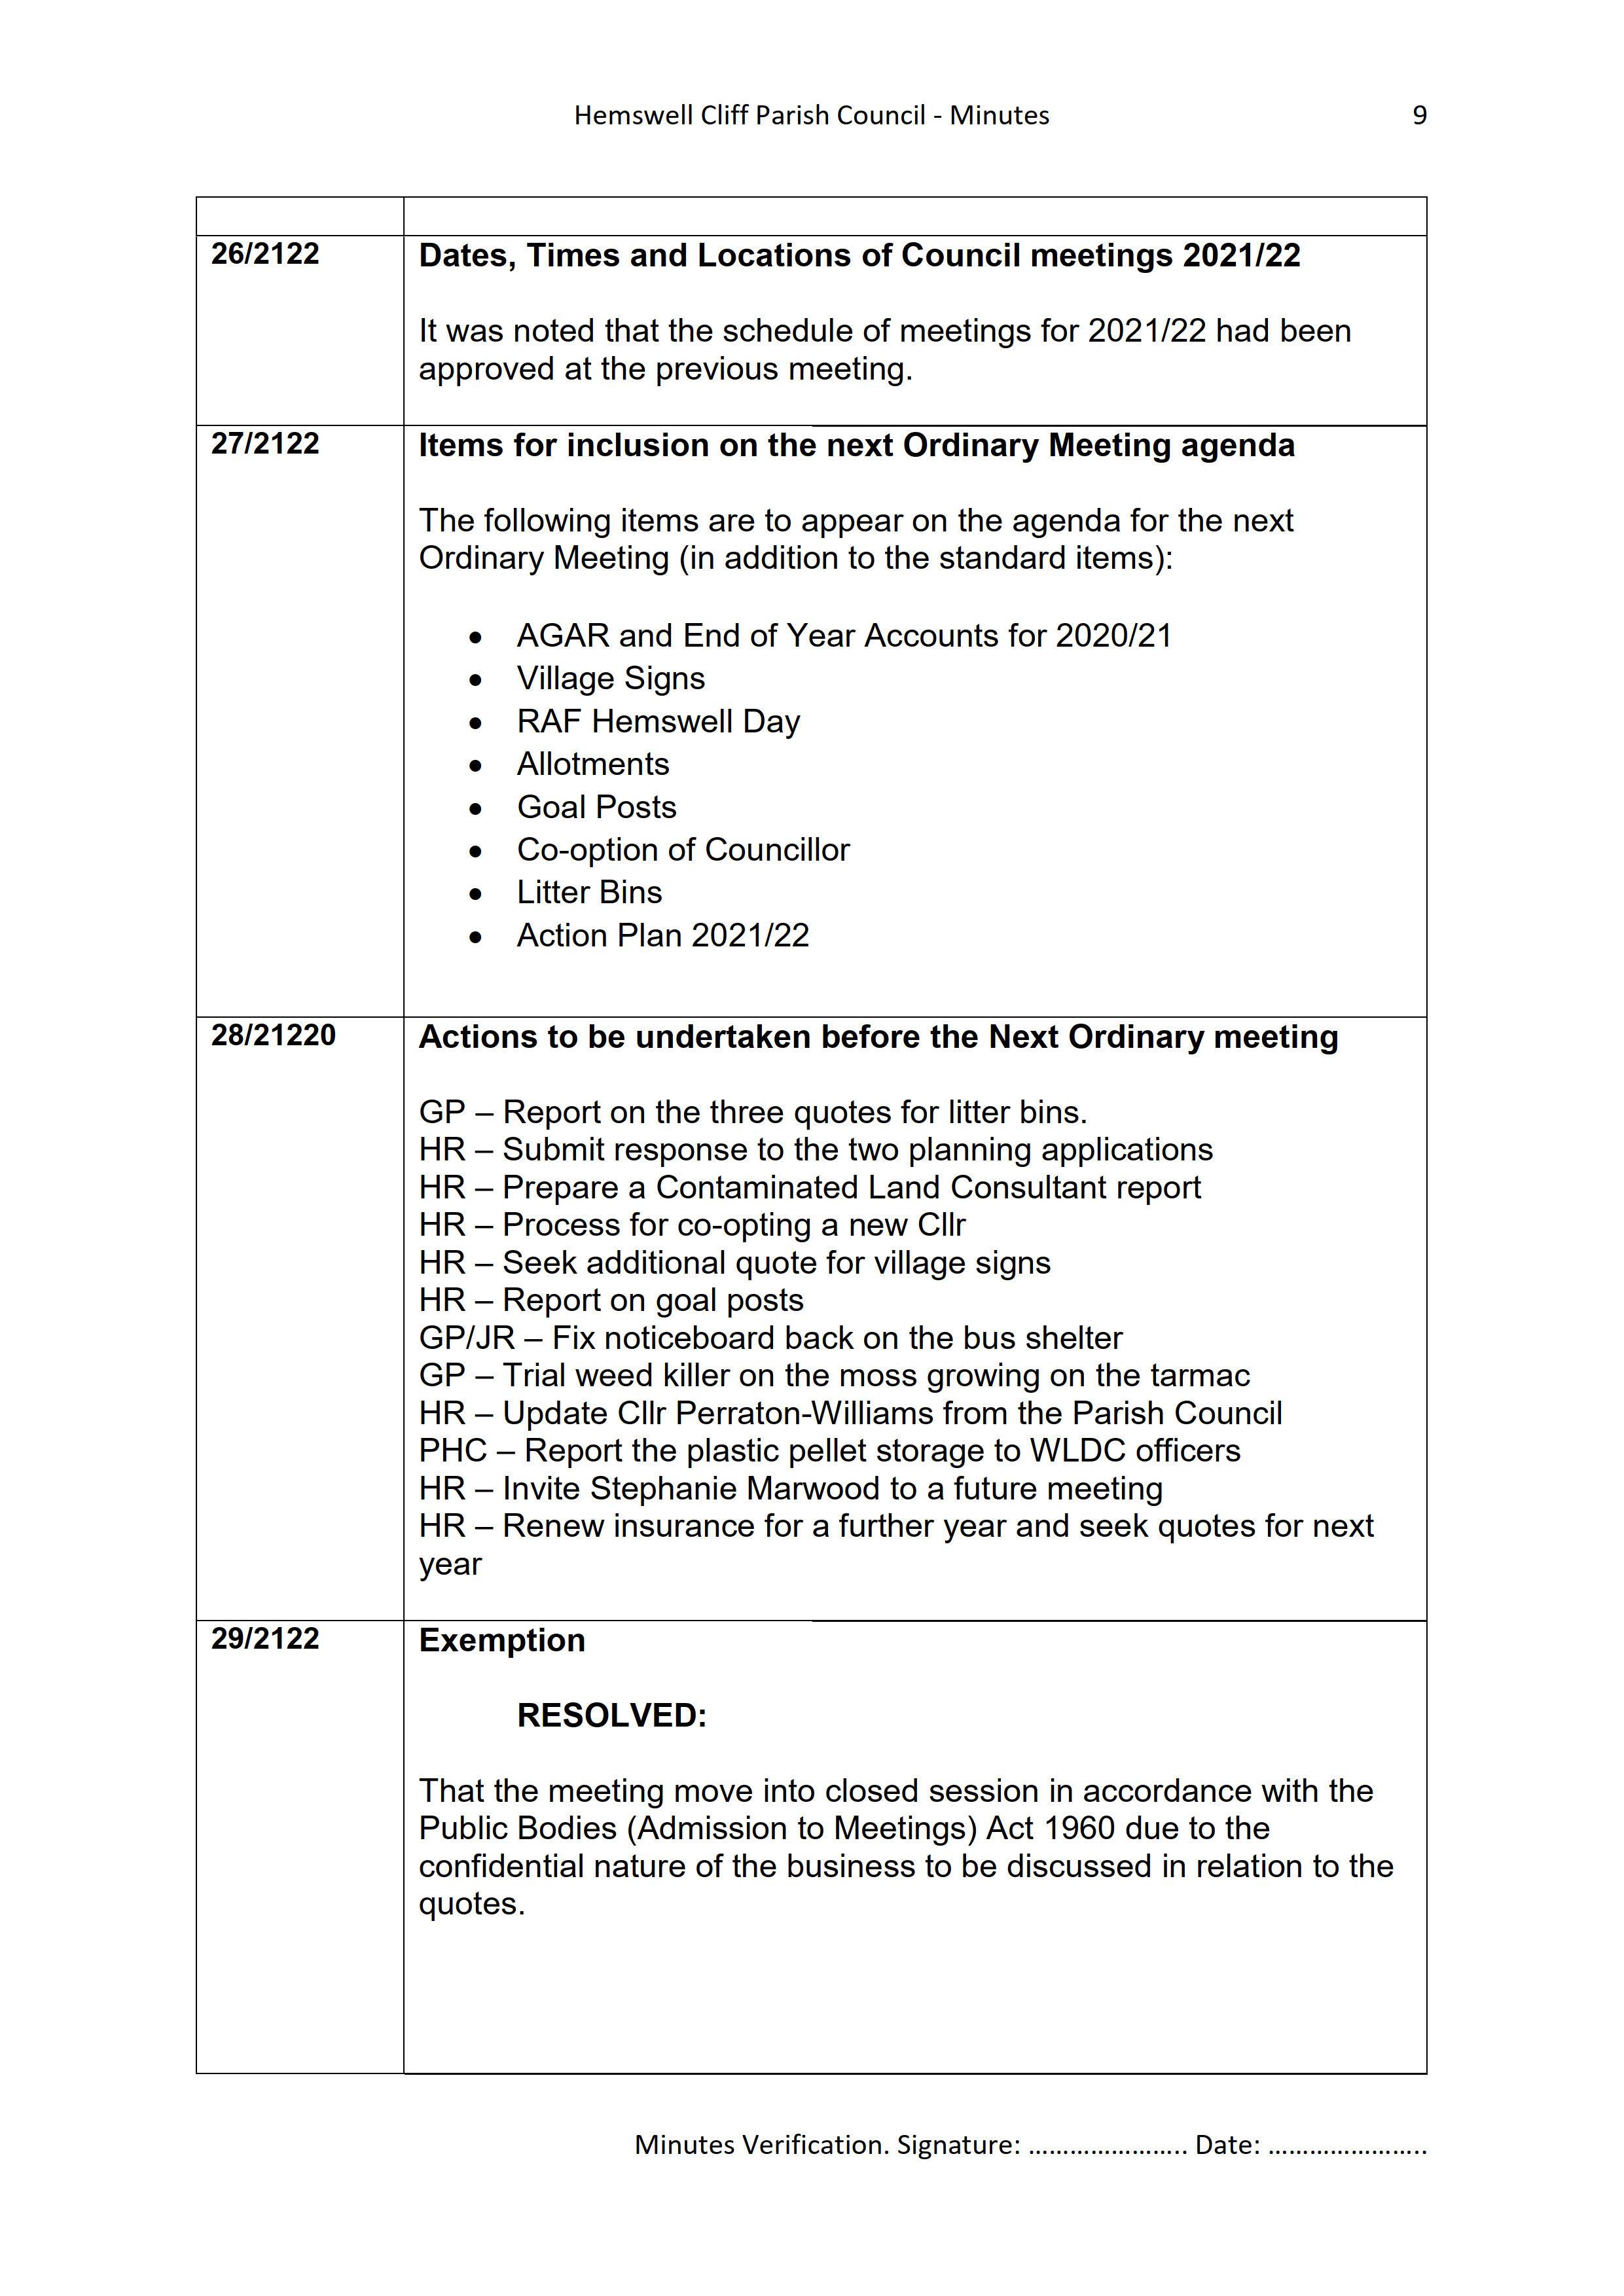 HCPC_AnnualMeetingMinutes_17.05.21_09.jpg